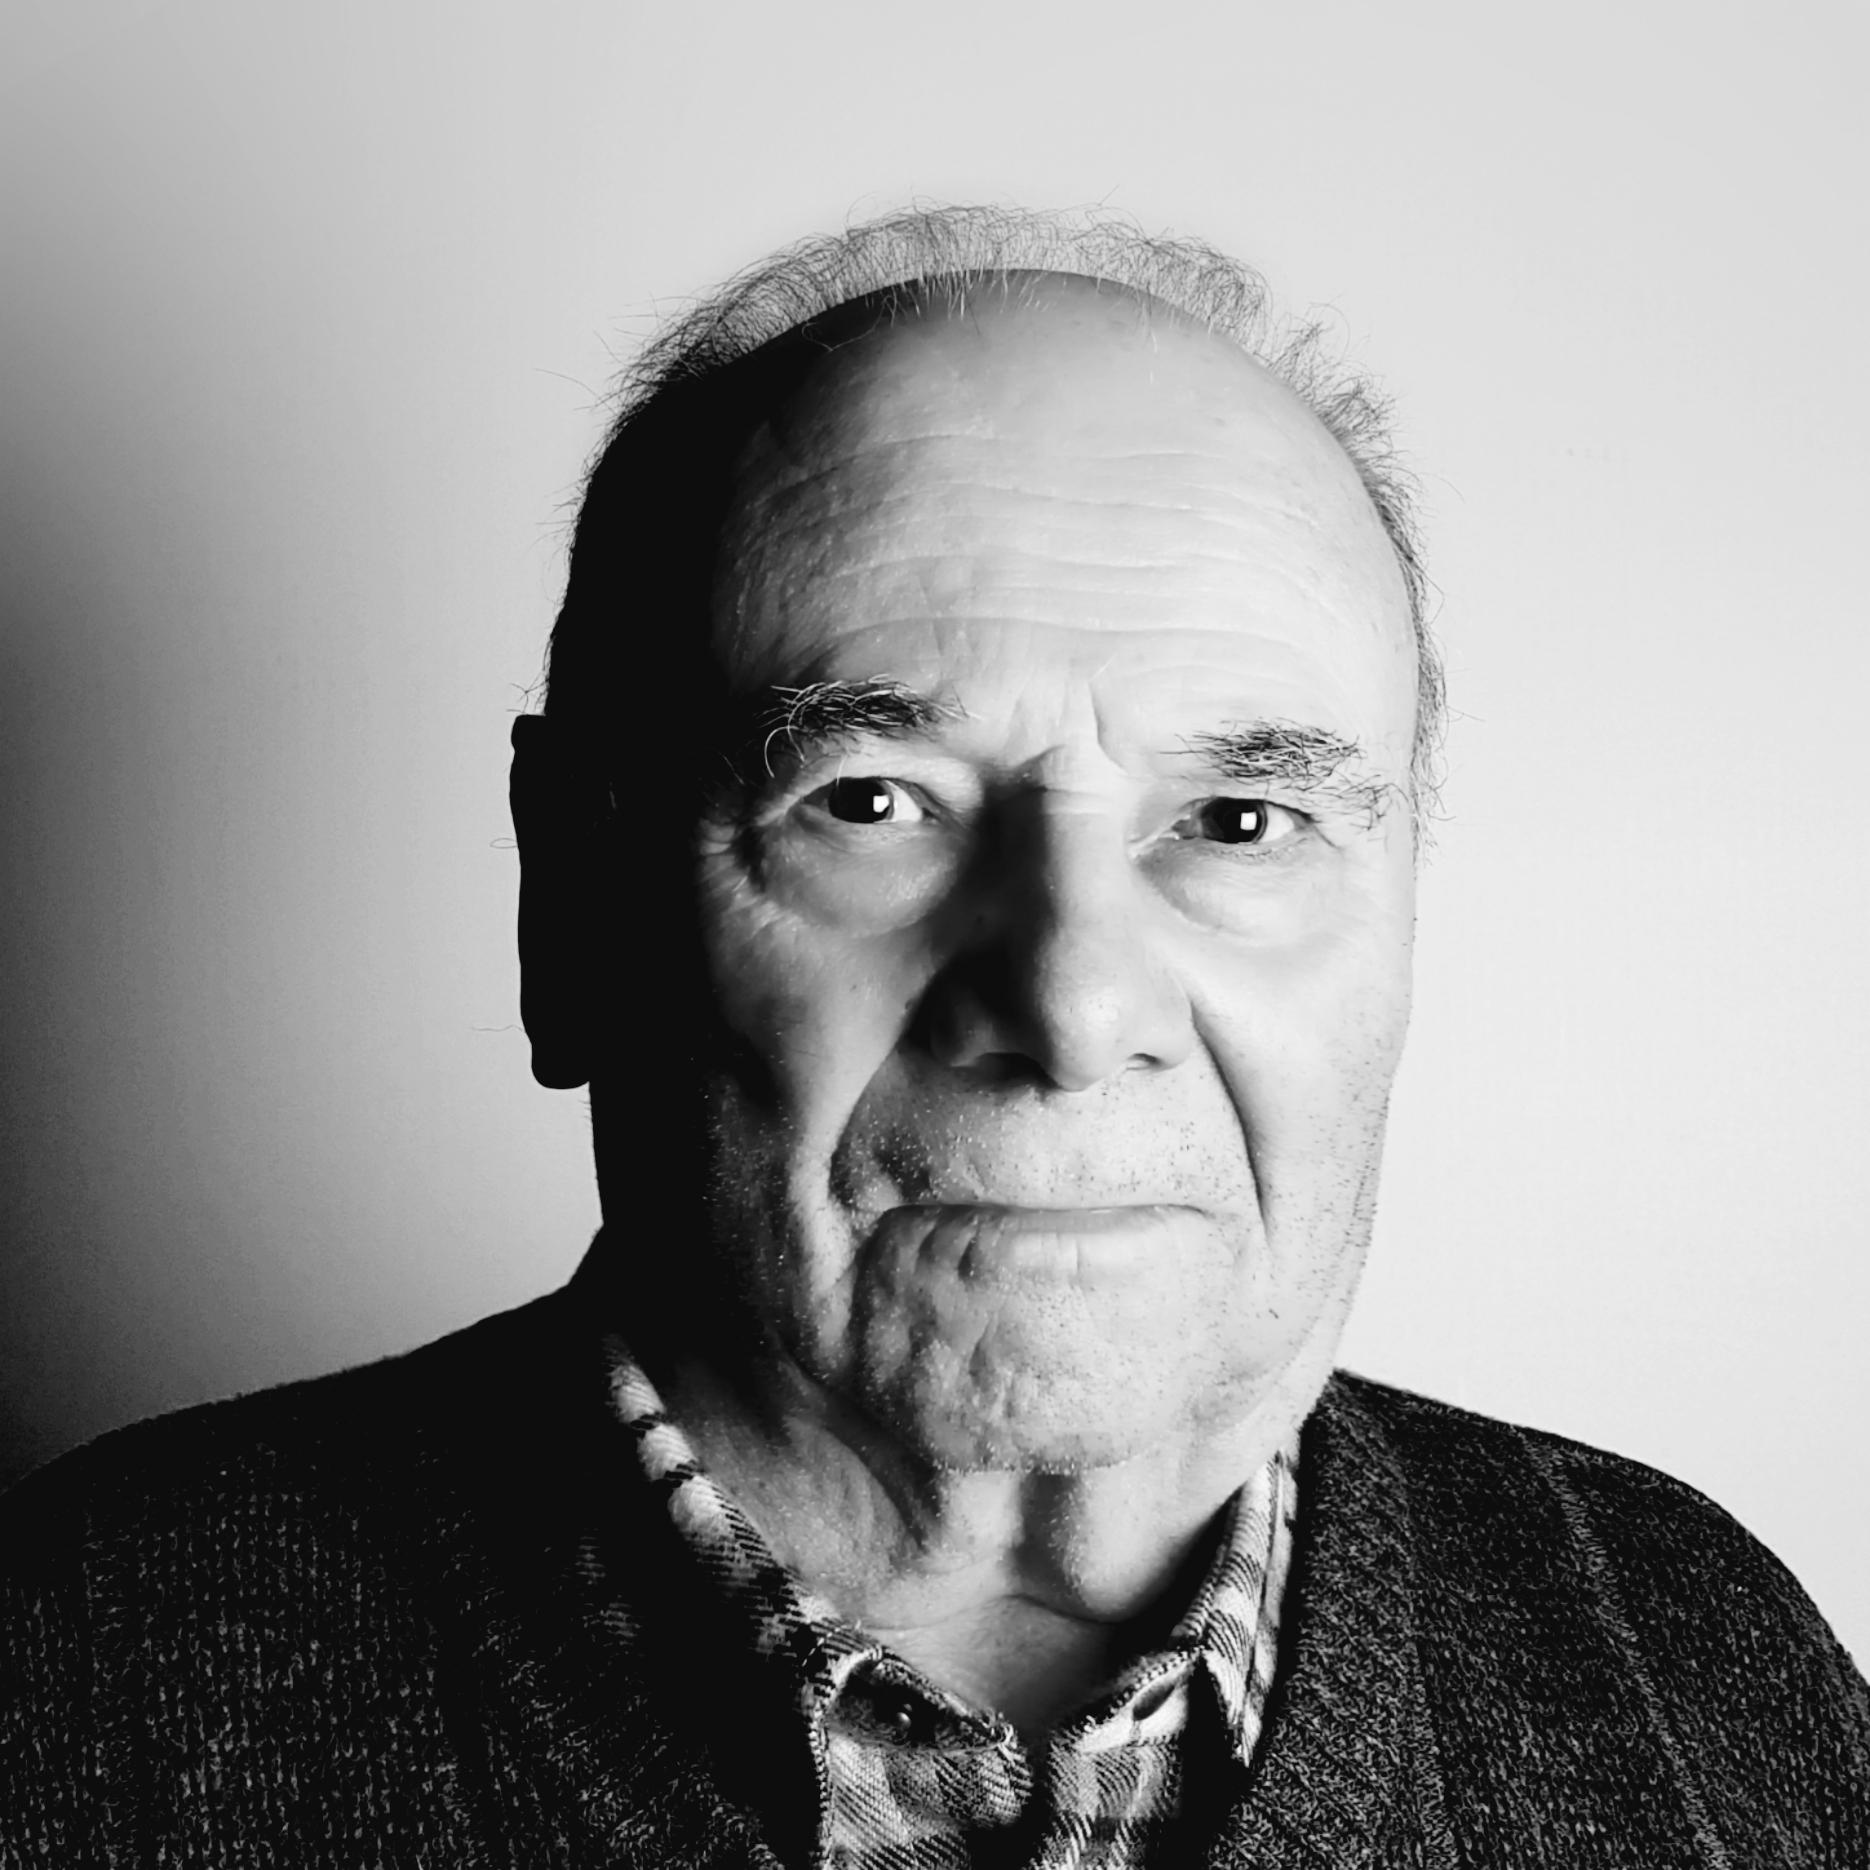 Paolo Musesti